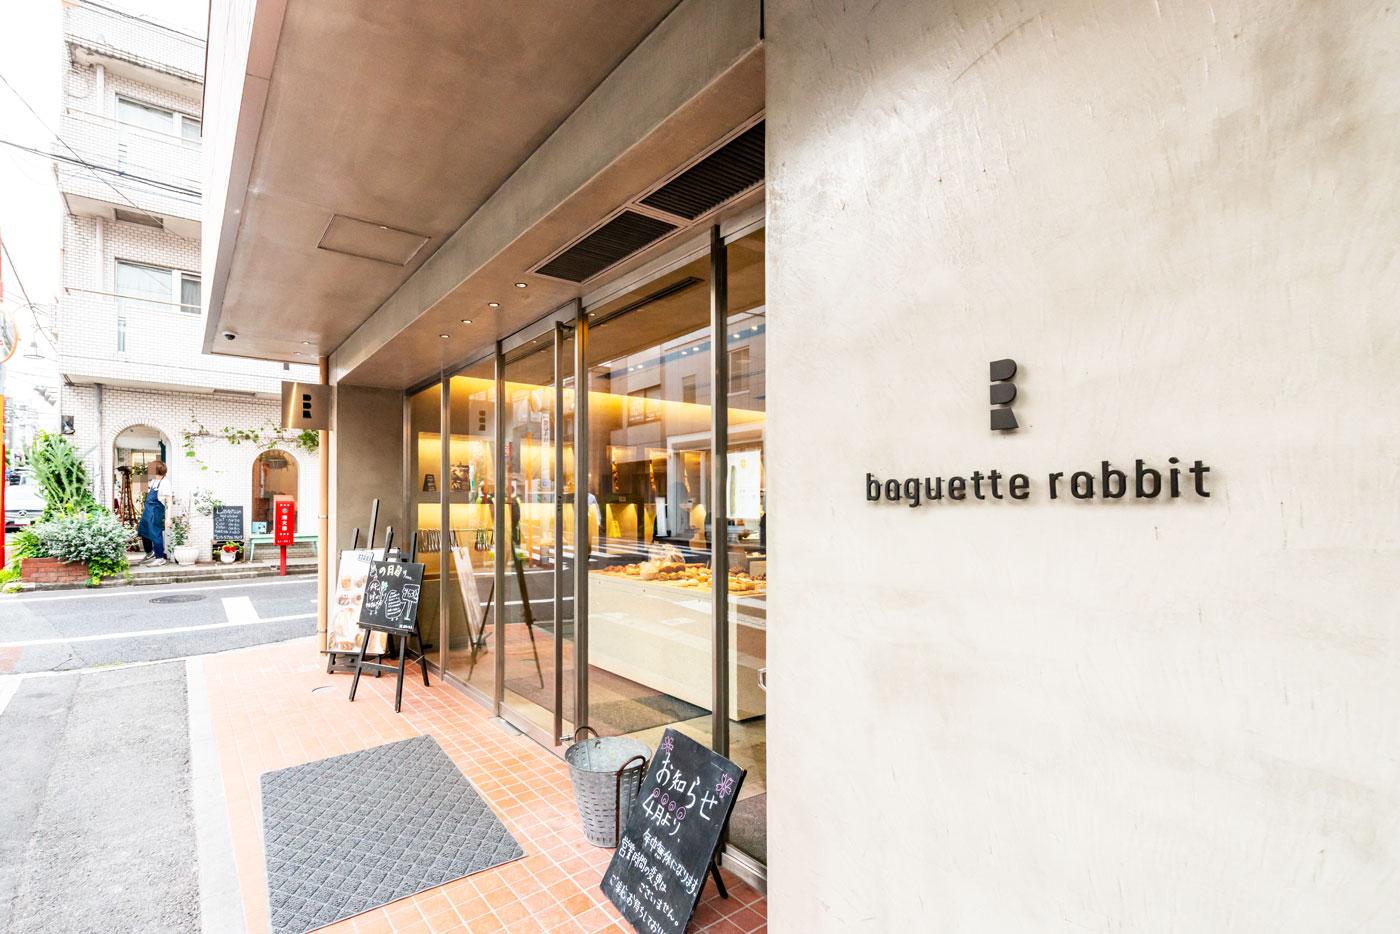 baguette rabbit自由が丘店(400m)名古屋の名店2018年2月オープン 店内で国産小麦を自家製粉